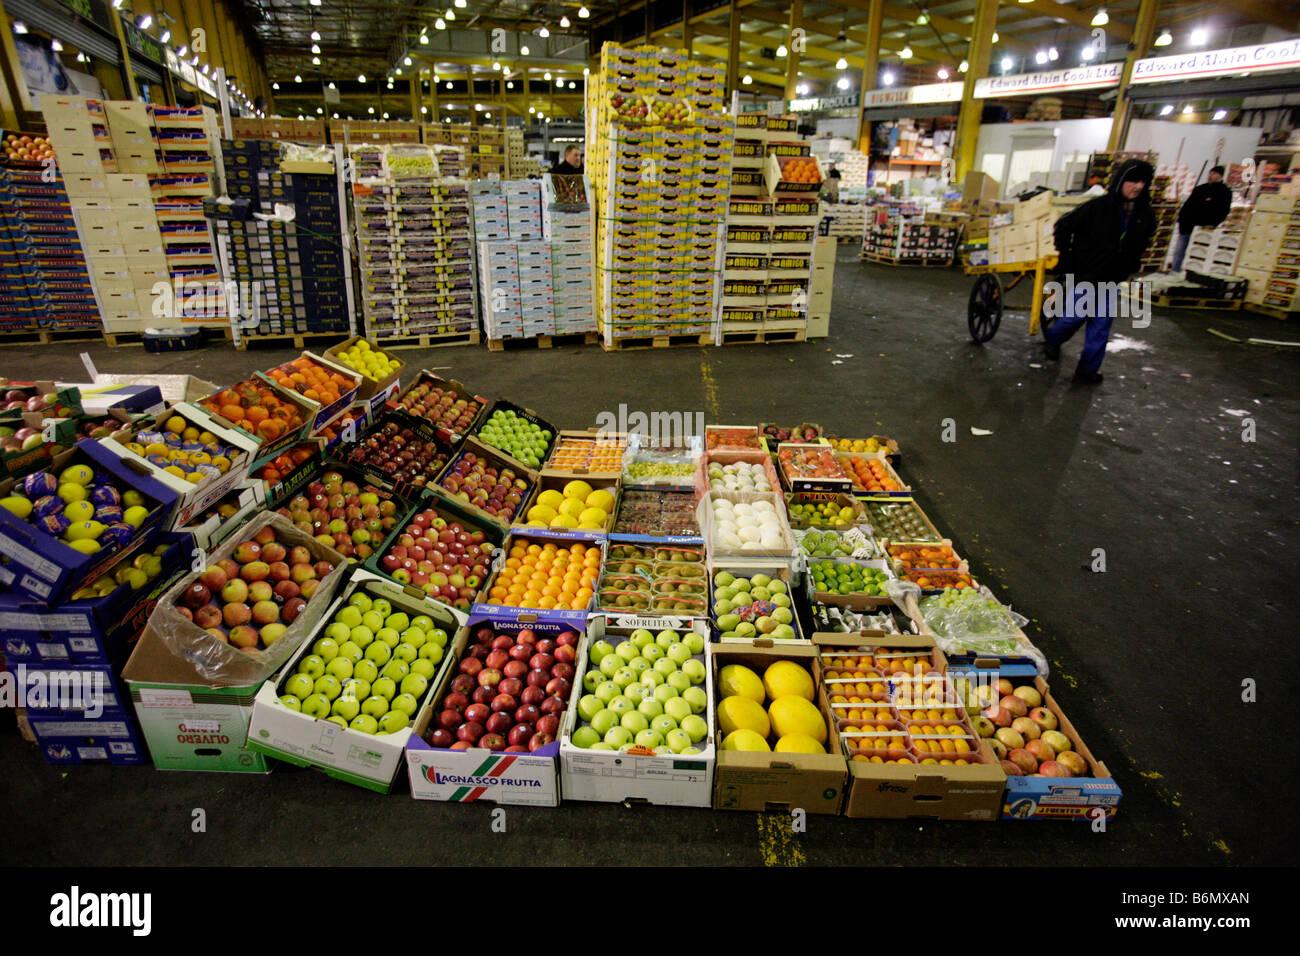 Wholesale Stock Photos & Wholesale Stock Images - Alamy